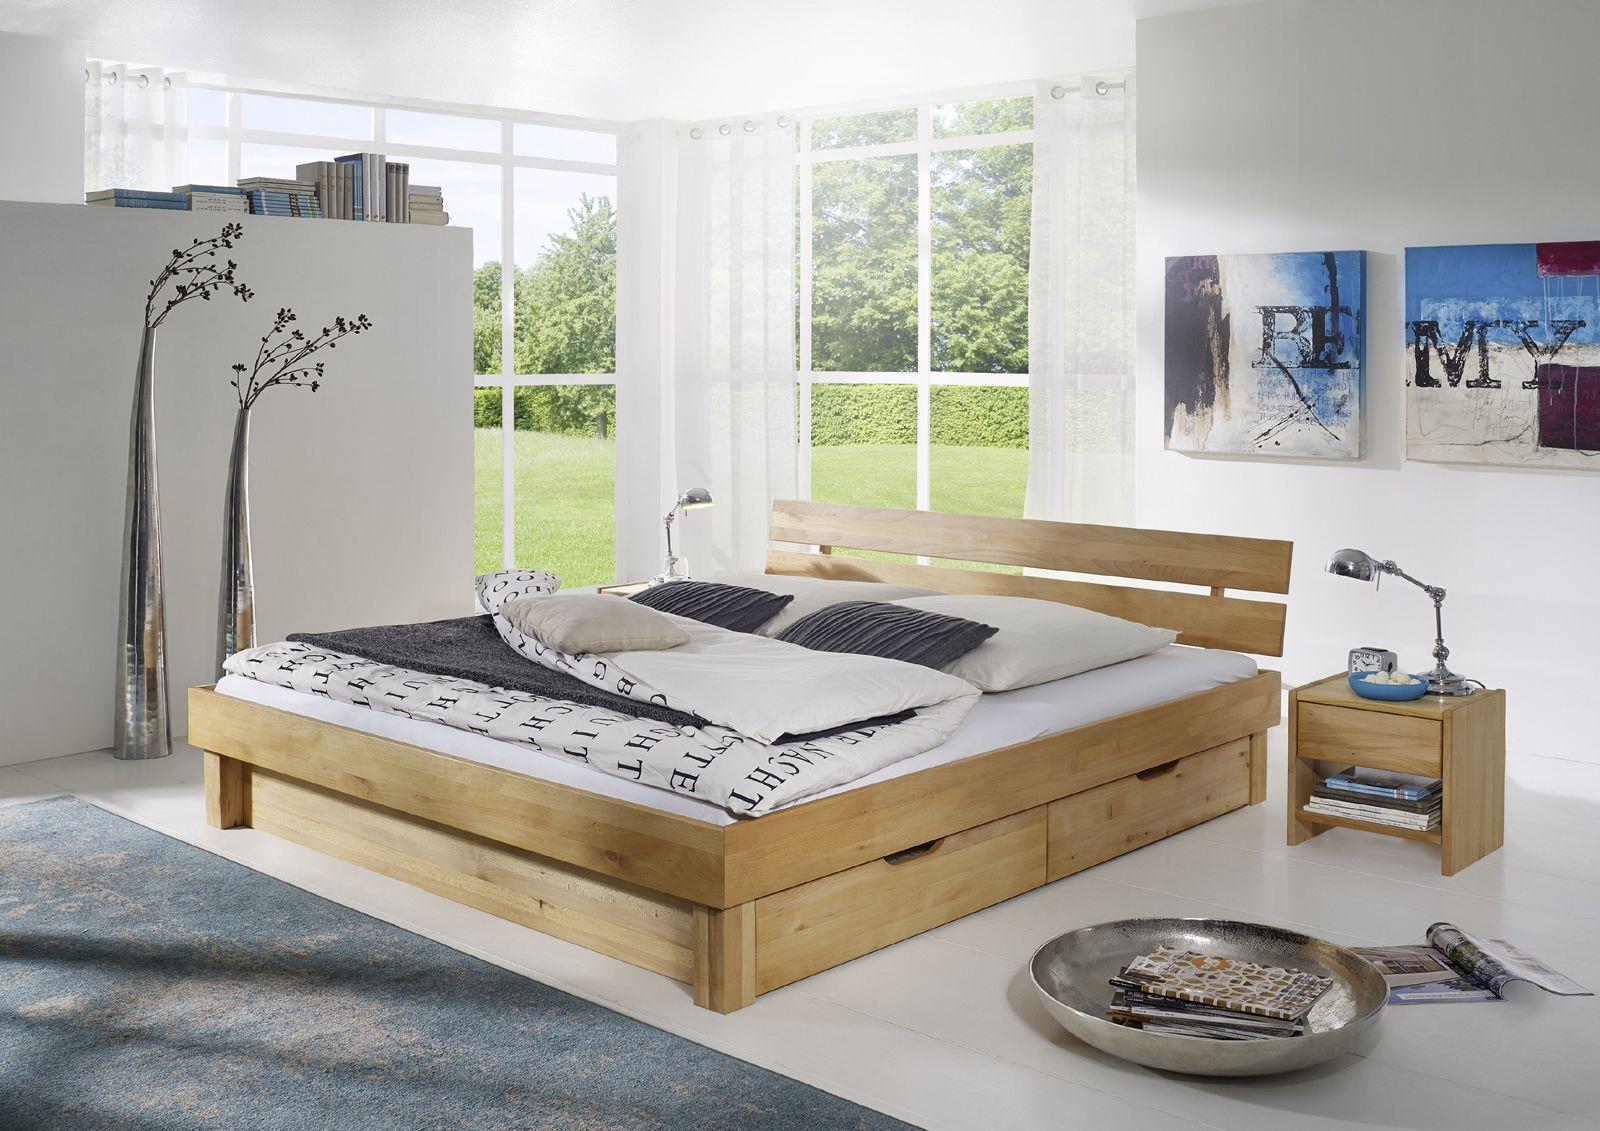 Sam Massivholzbett 160 Cm Geteilt Kernbuche Bettkasten Campino Home Bed Furnishings